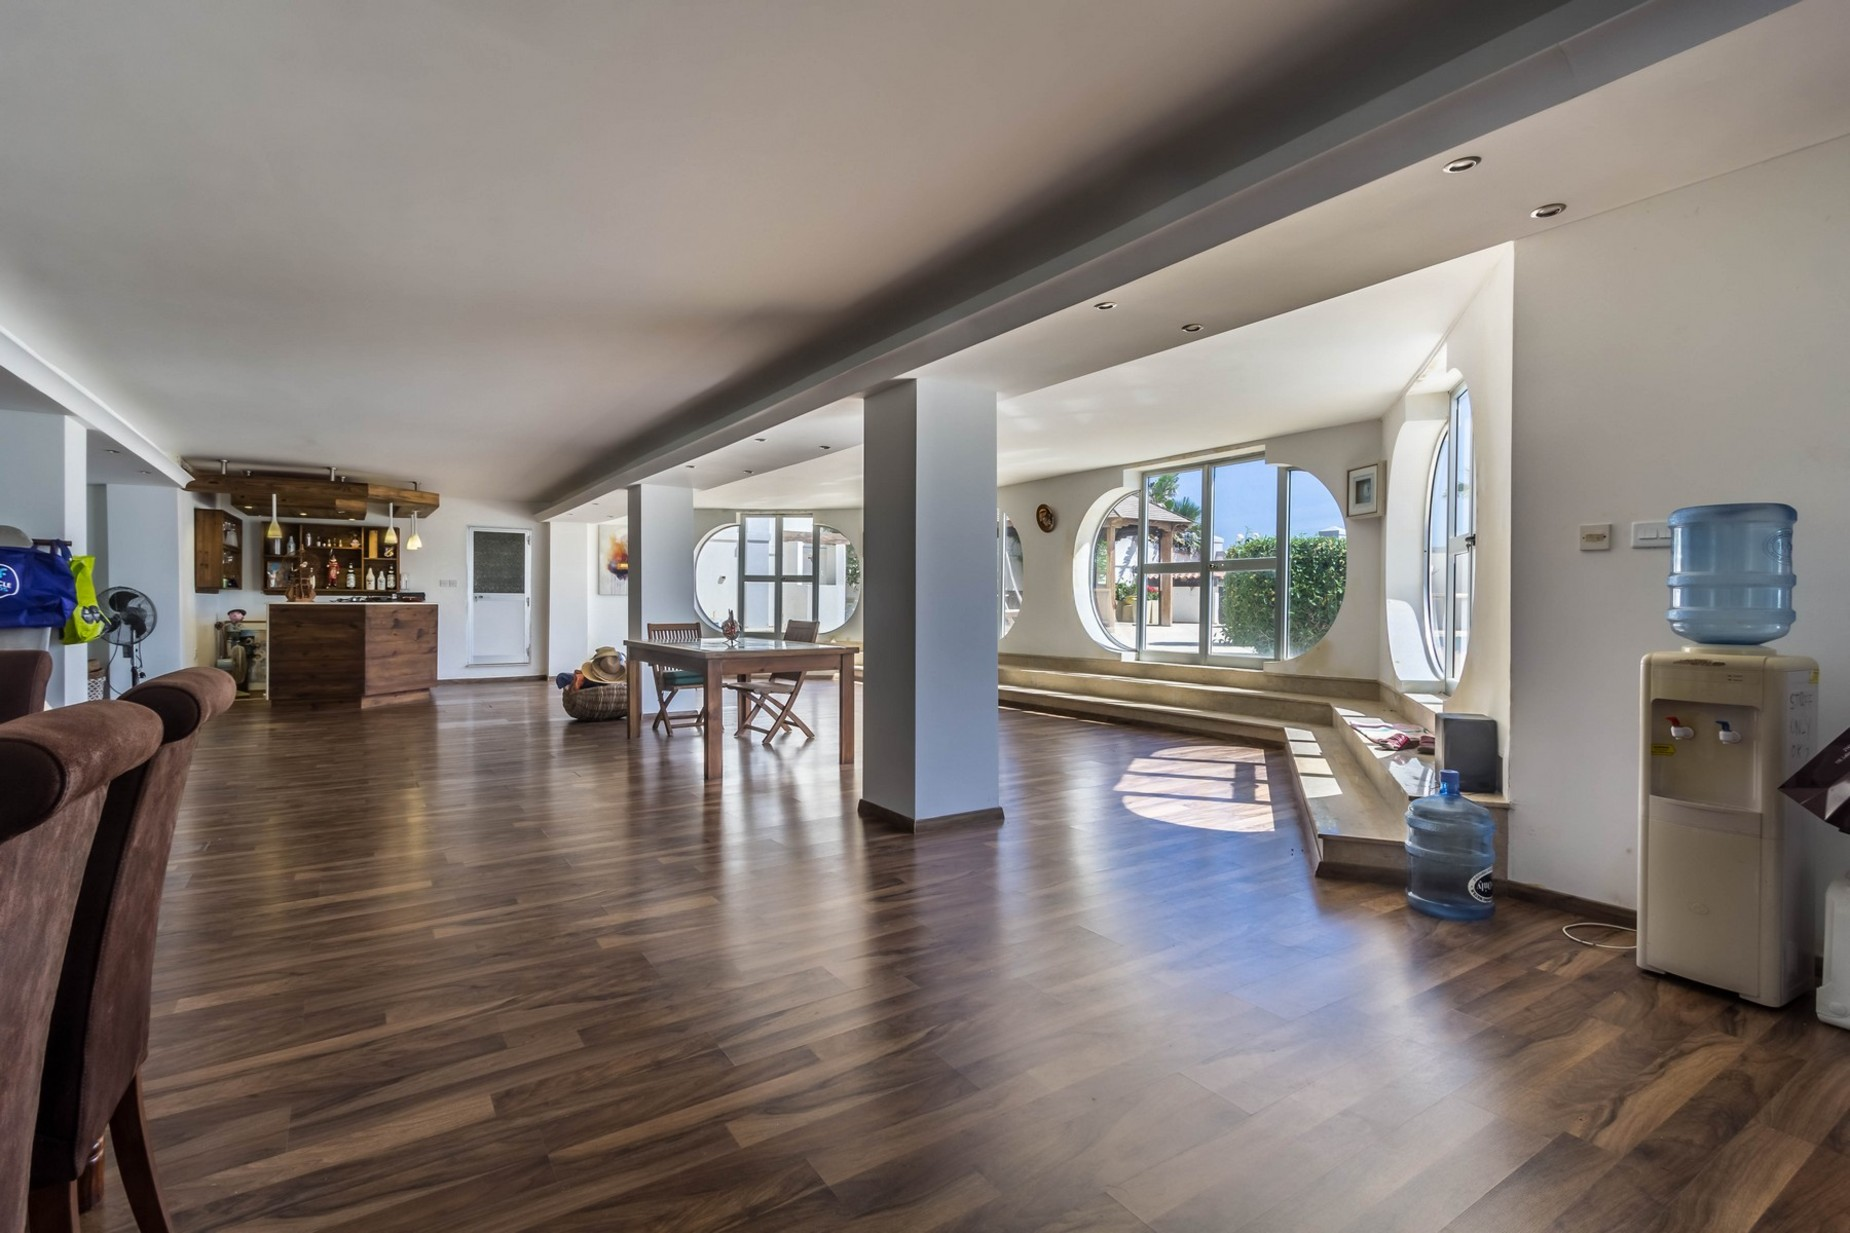 3 bed Villa For Sale in Marsascala, Marsascala - thumb 16